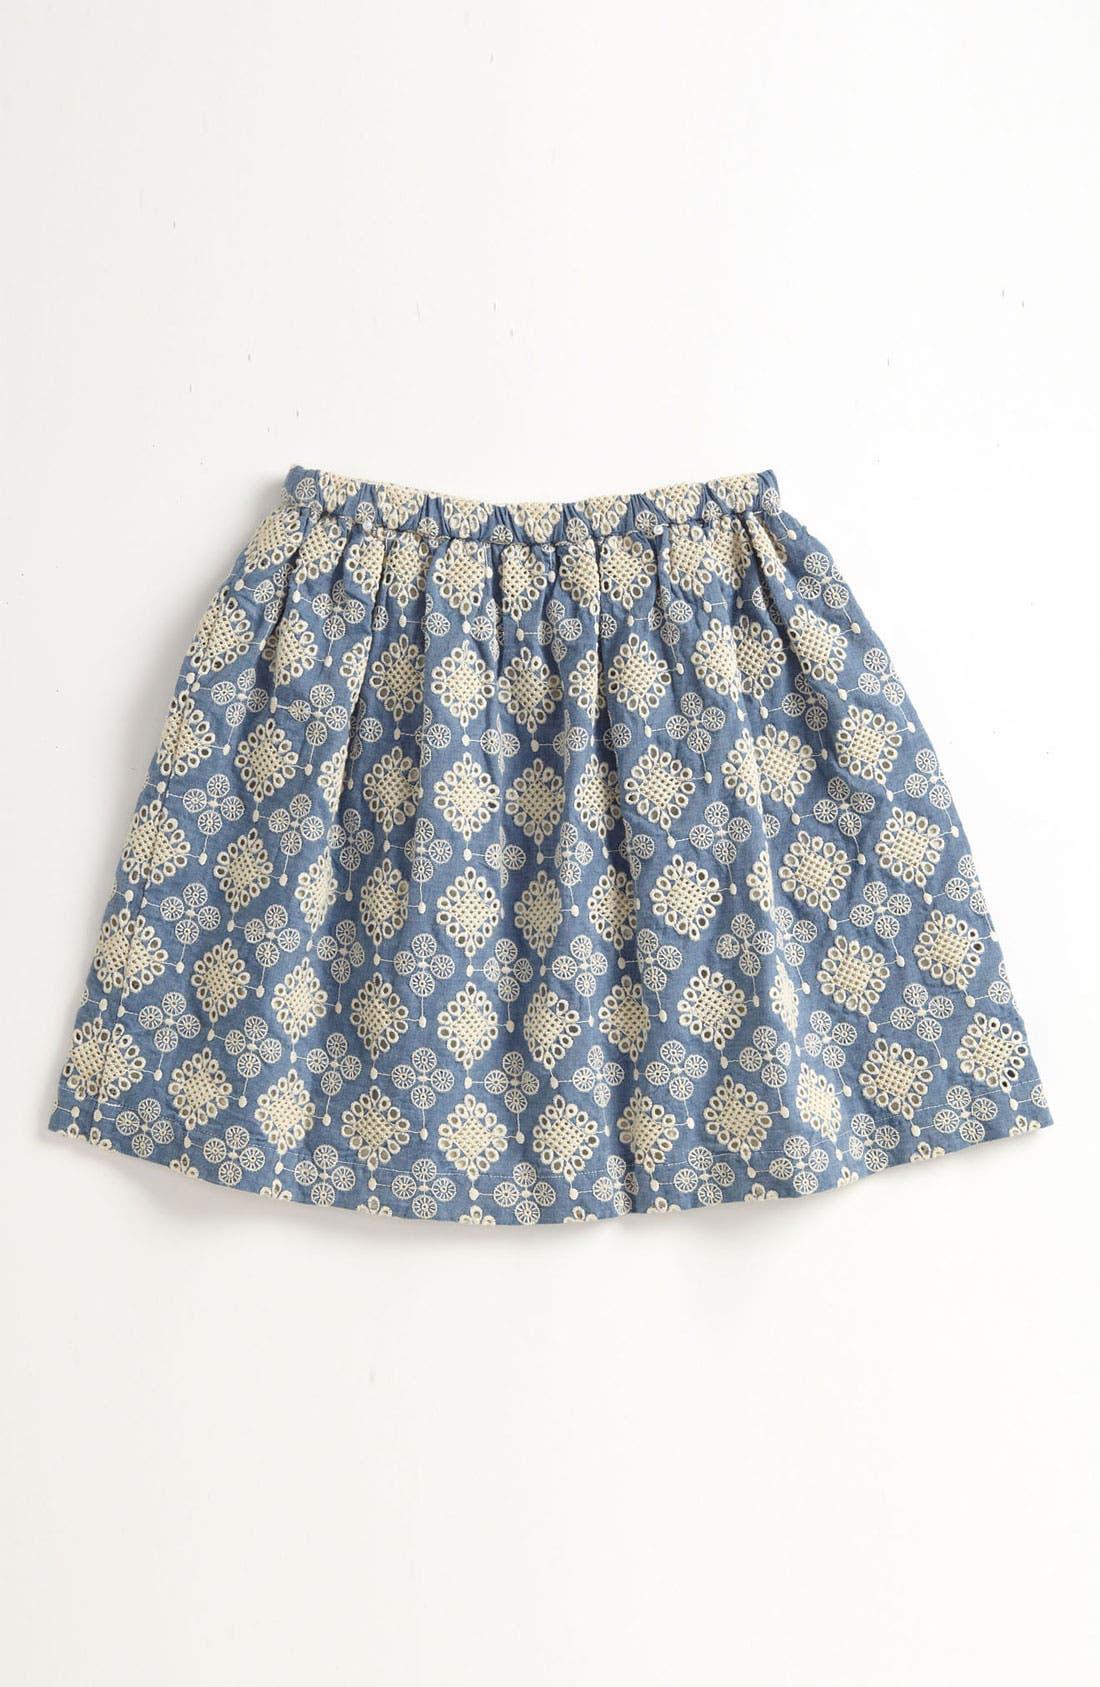 Main Image - Peek 'Nina' Skirt (Big Girls)